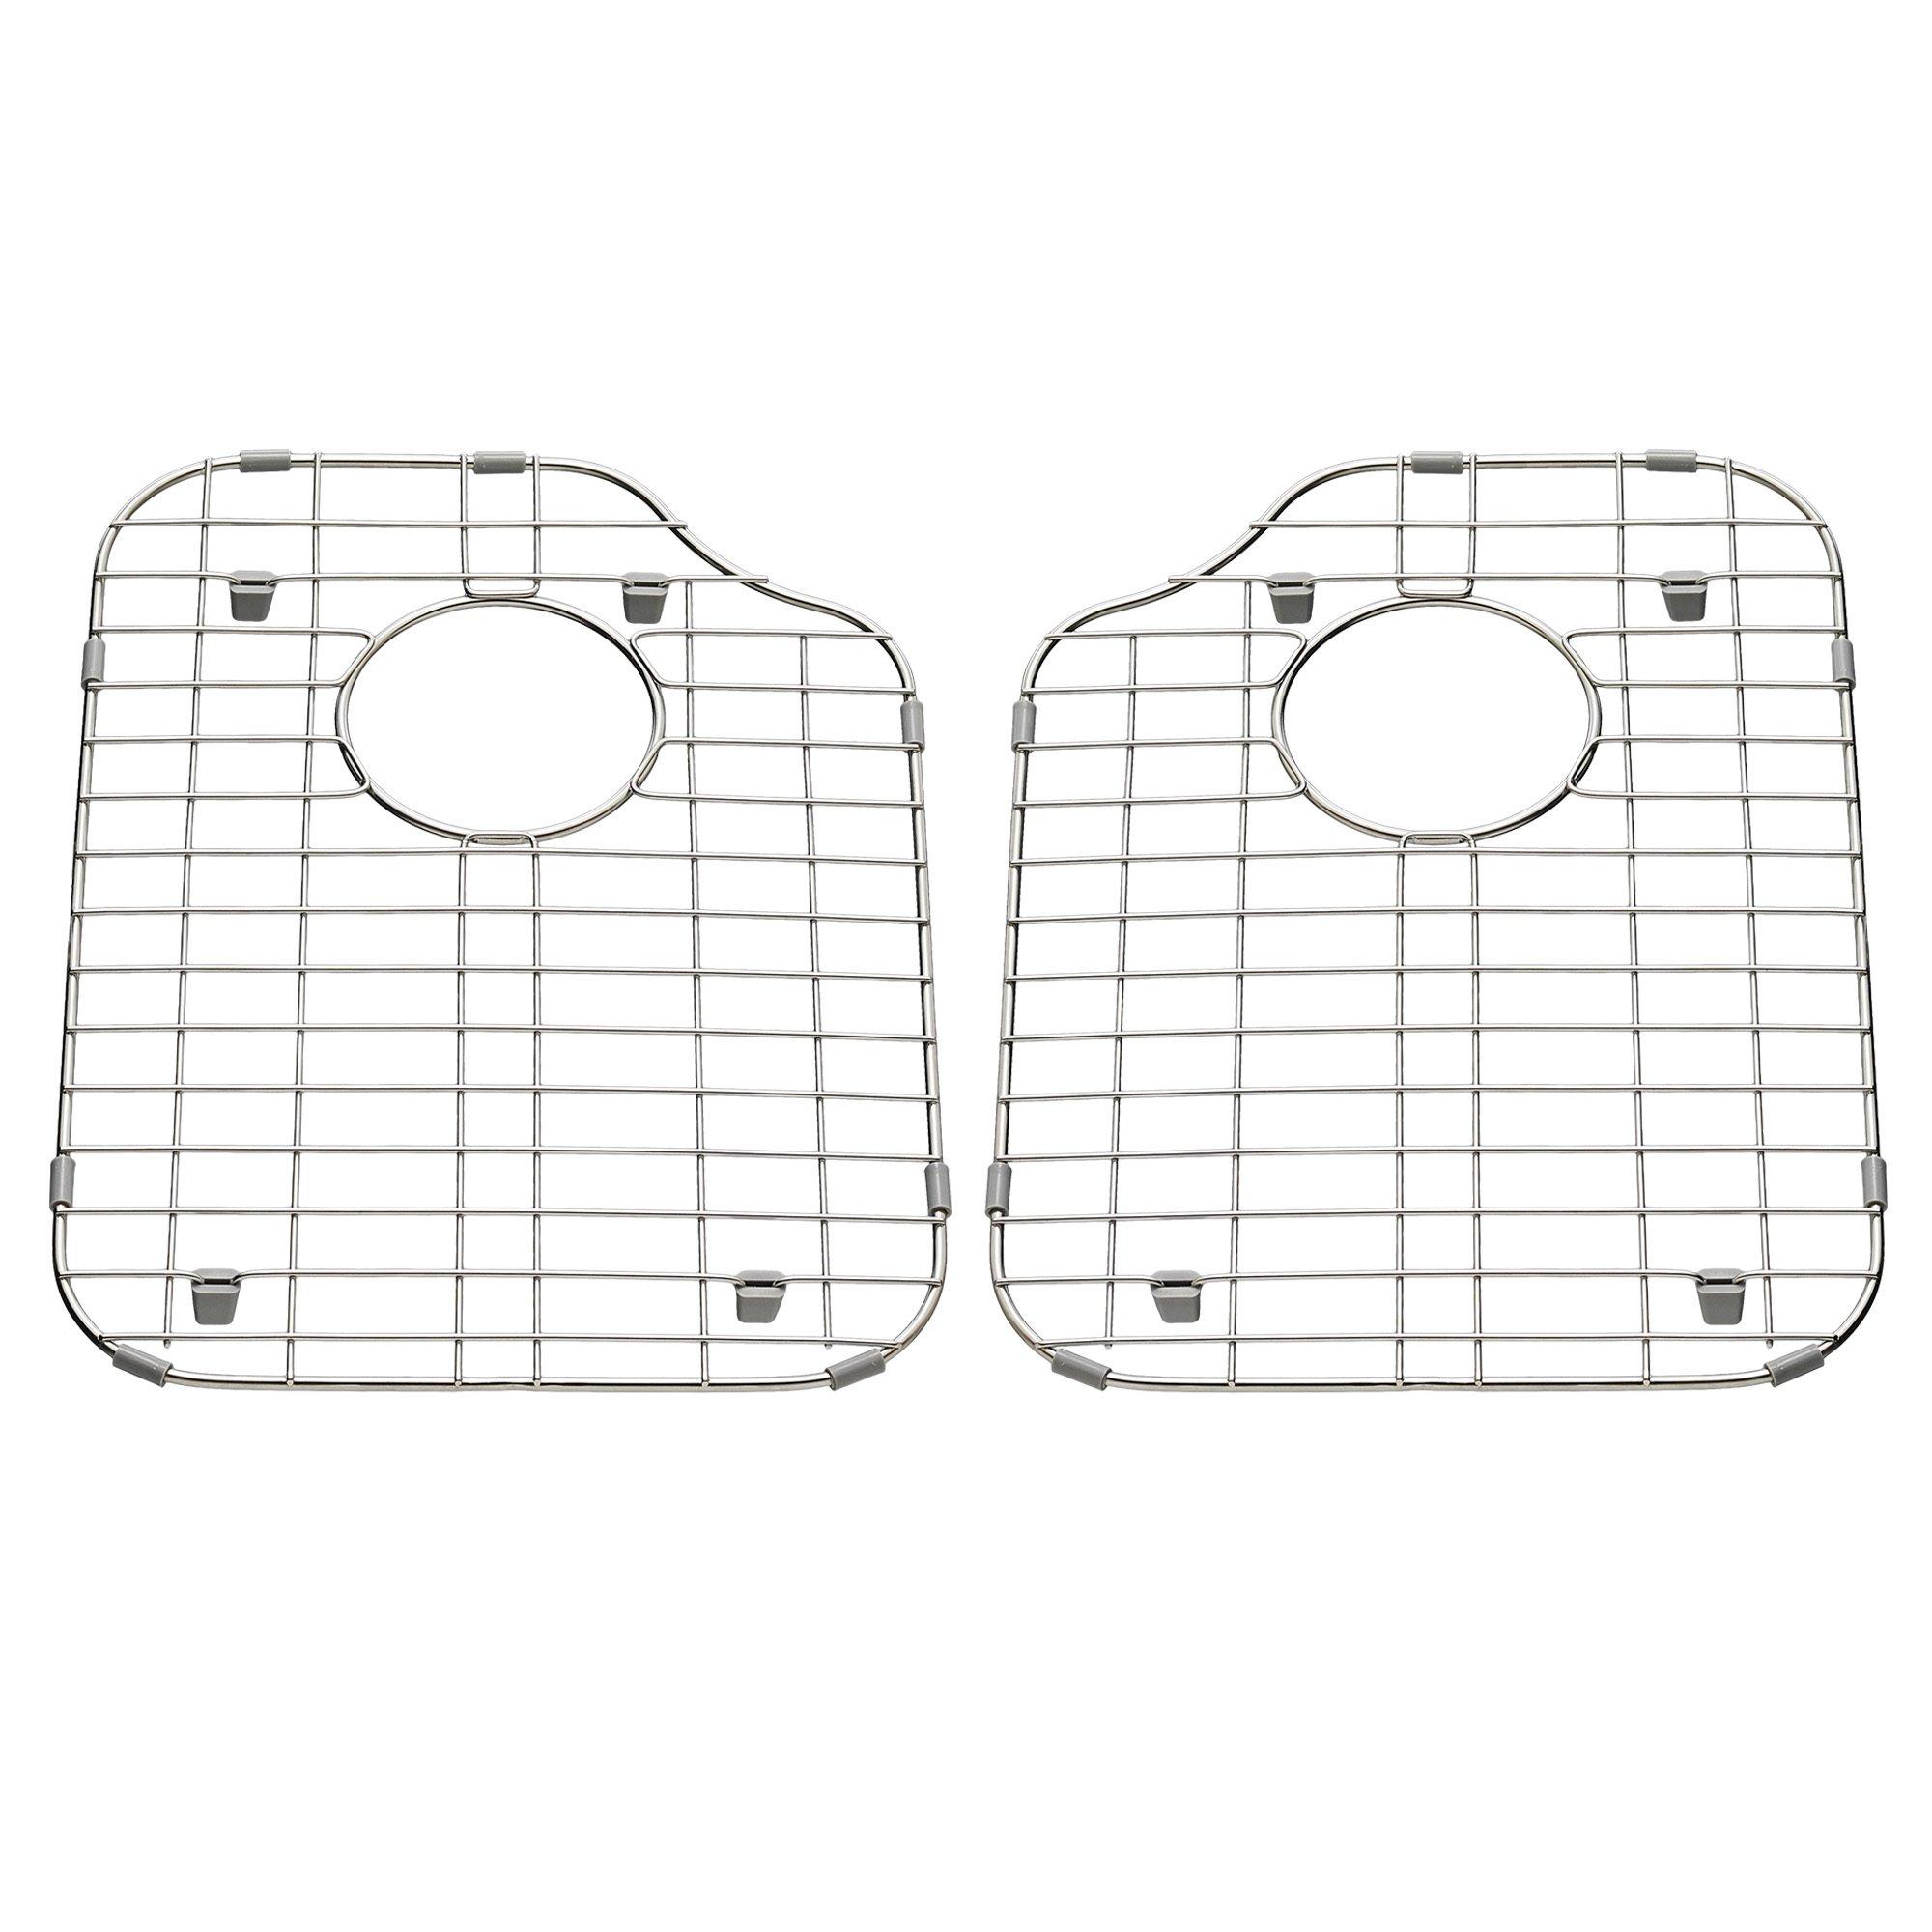 American Standard 7436000.075 2-Pack 11.93-In X 16.73-In Sink Grids, Stainless Steel